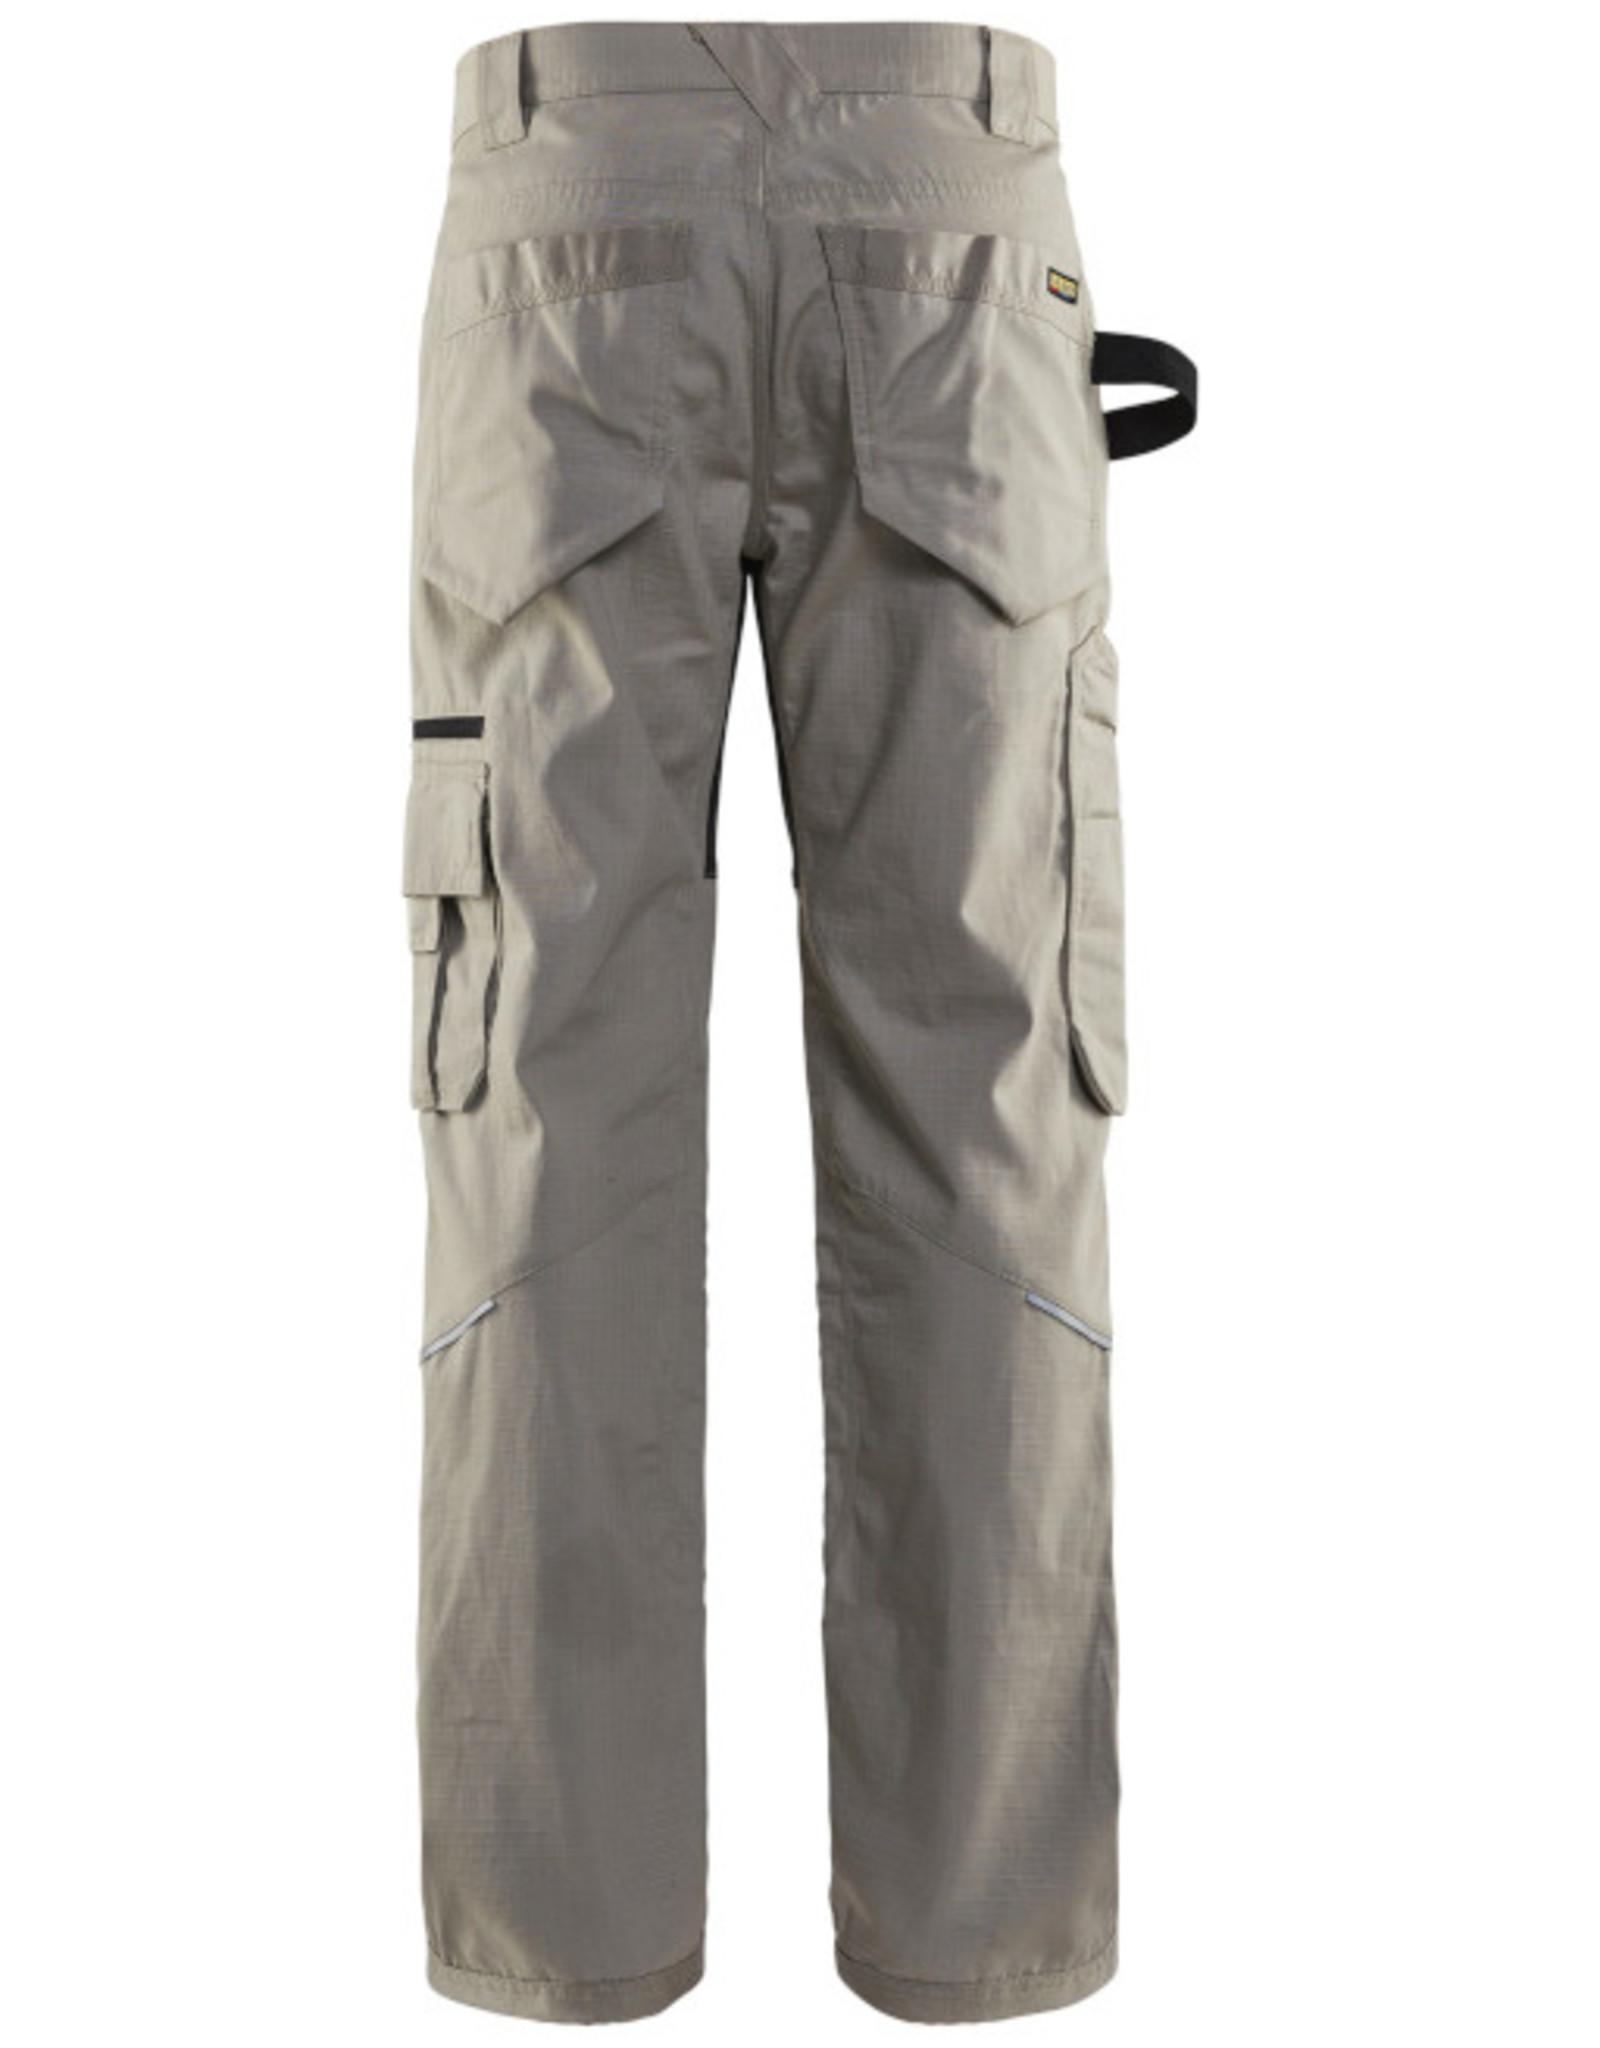 Blaklader 1690 Rip Stop Pants